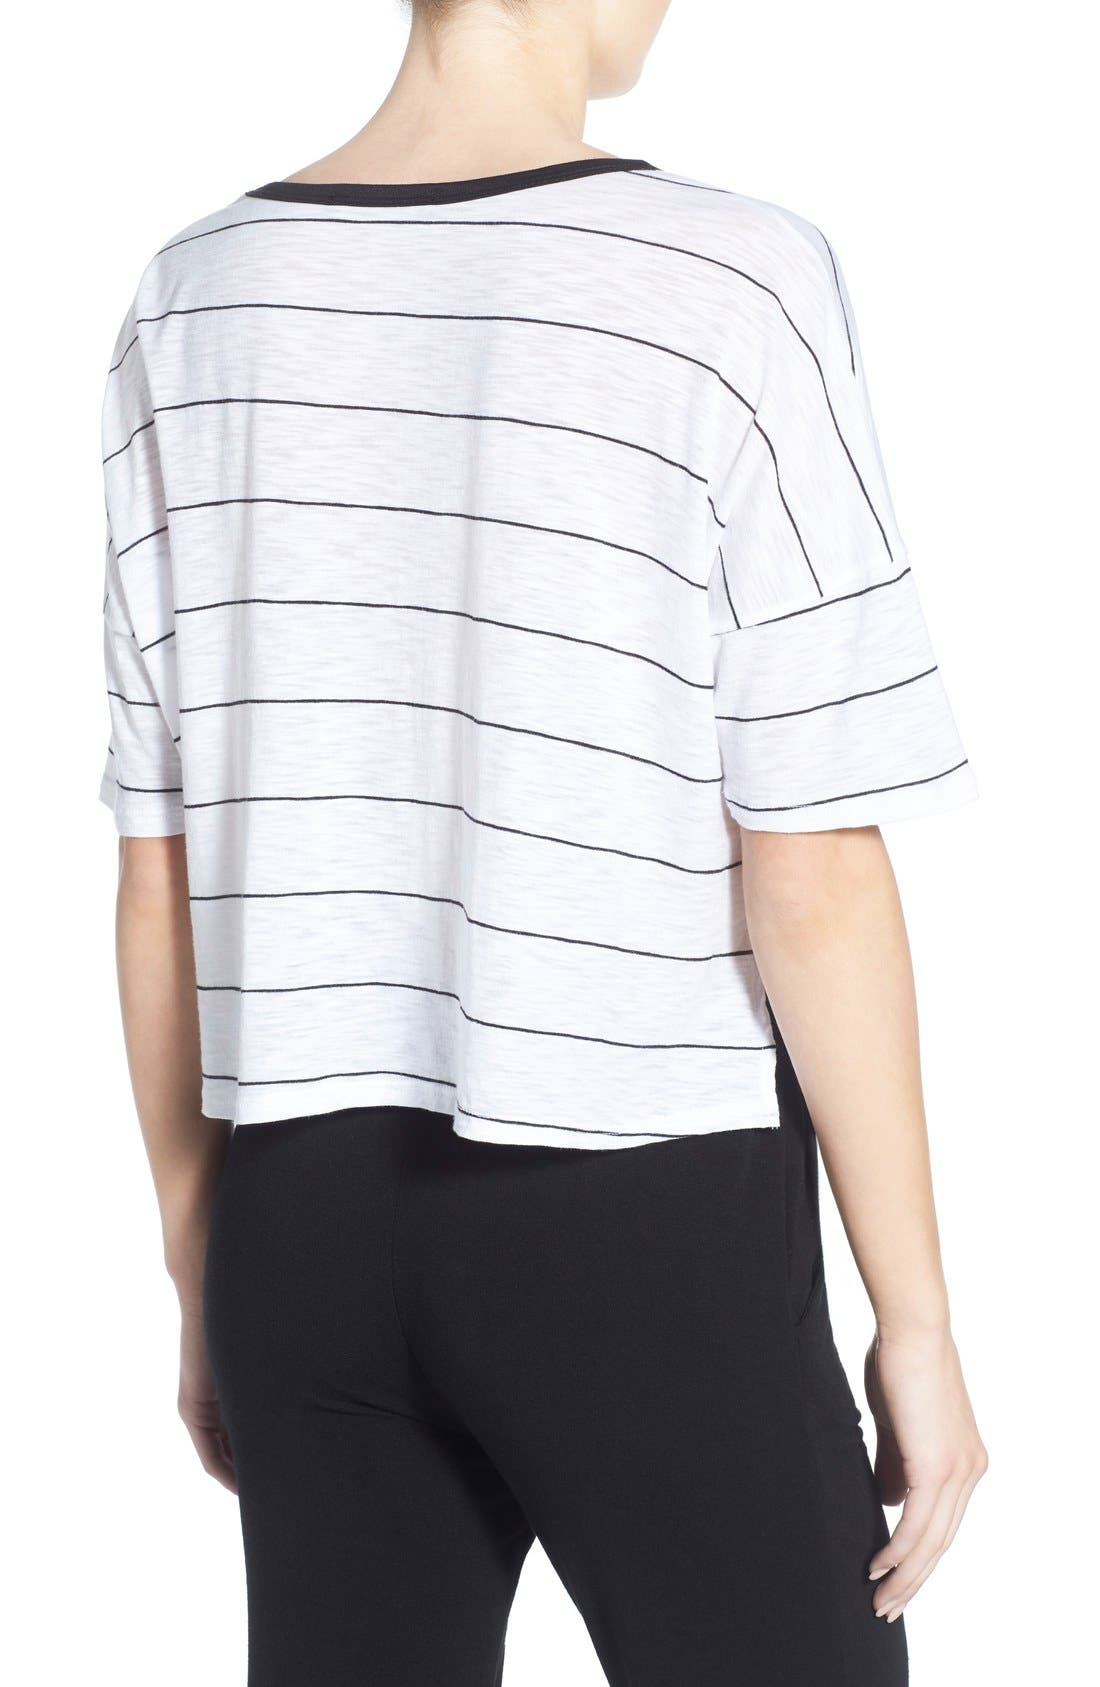 Alternate Image 2  - Michelle by Comune Stripe Crop Tee